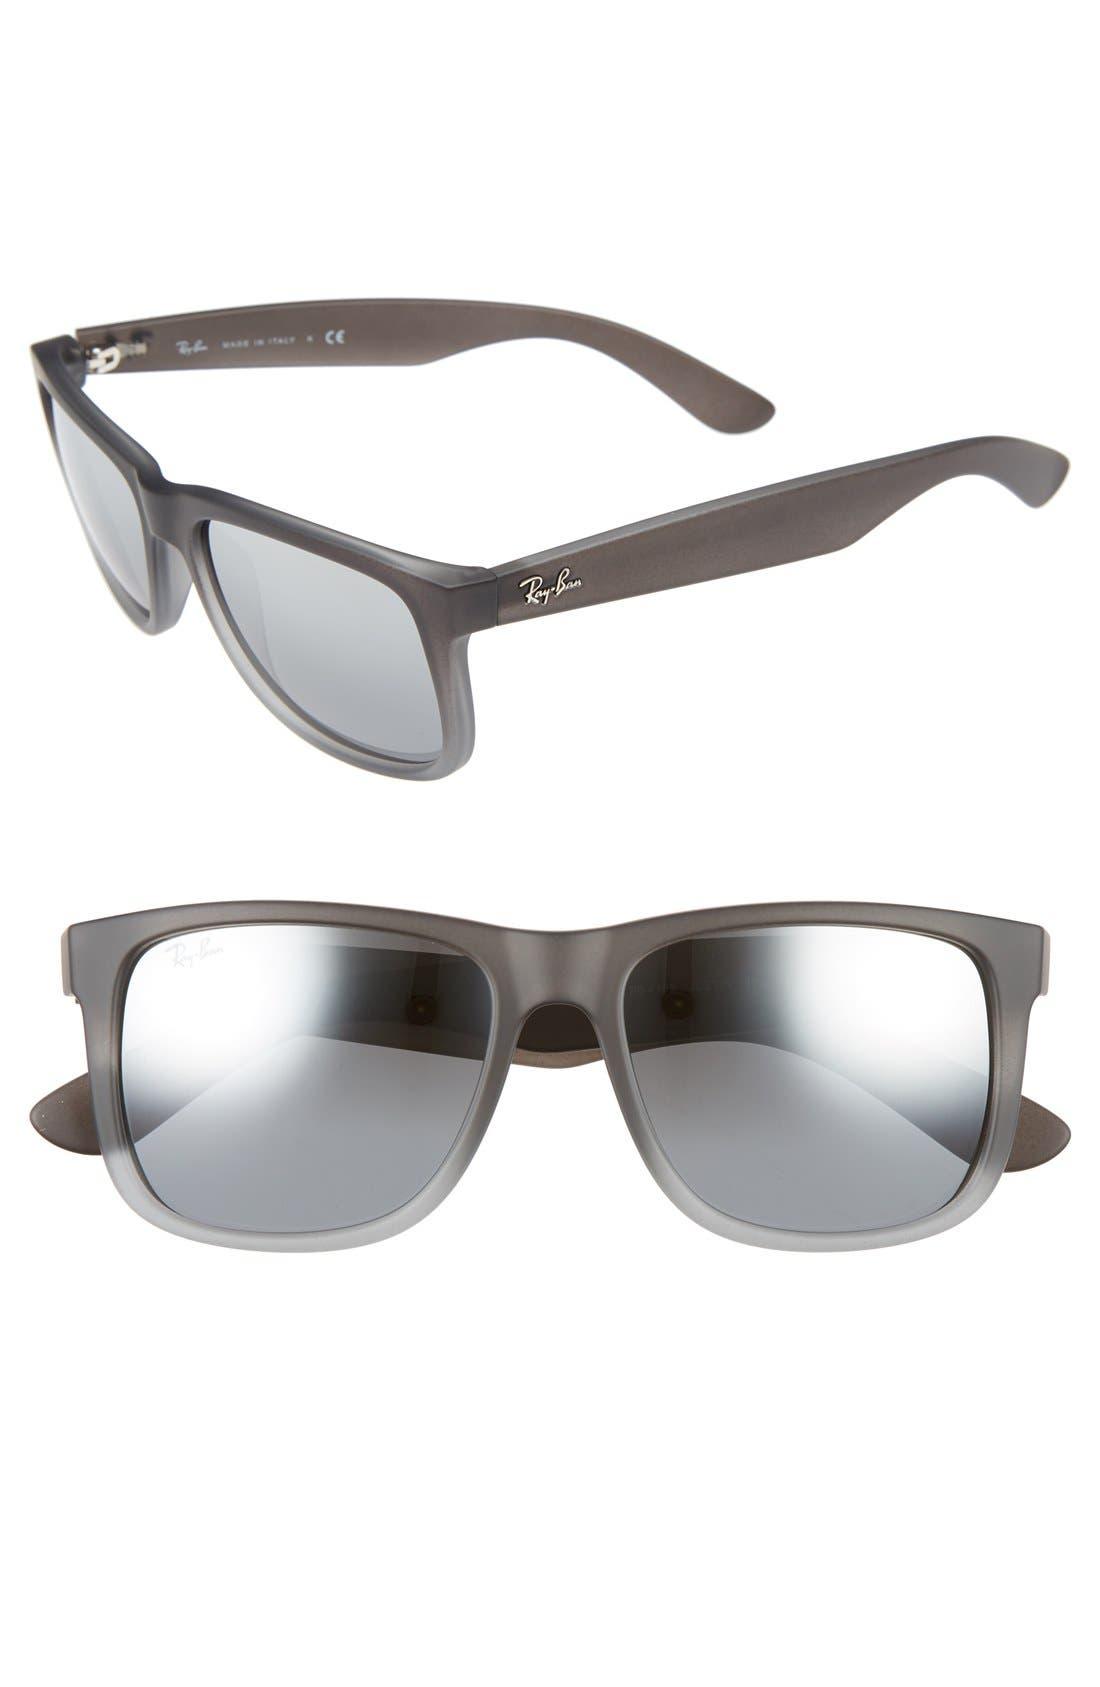 54mm Sunglasses,                         Main,                         color, Black/ Grey Gradient